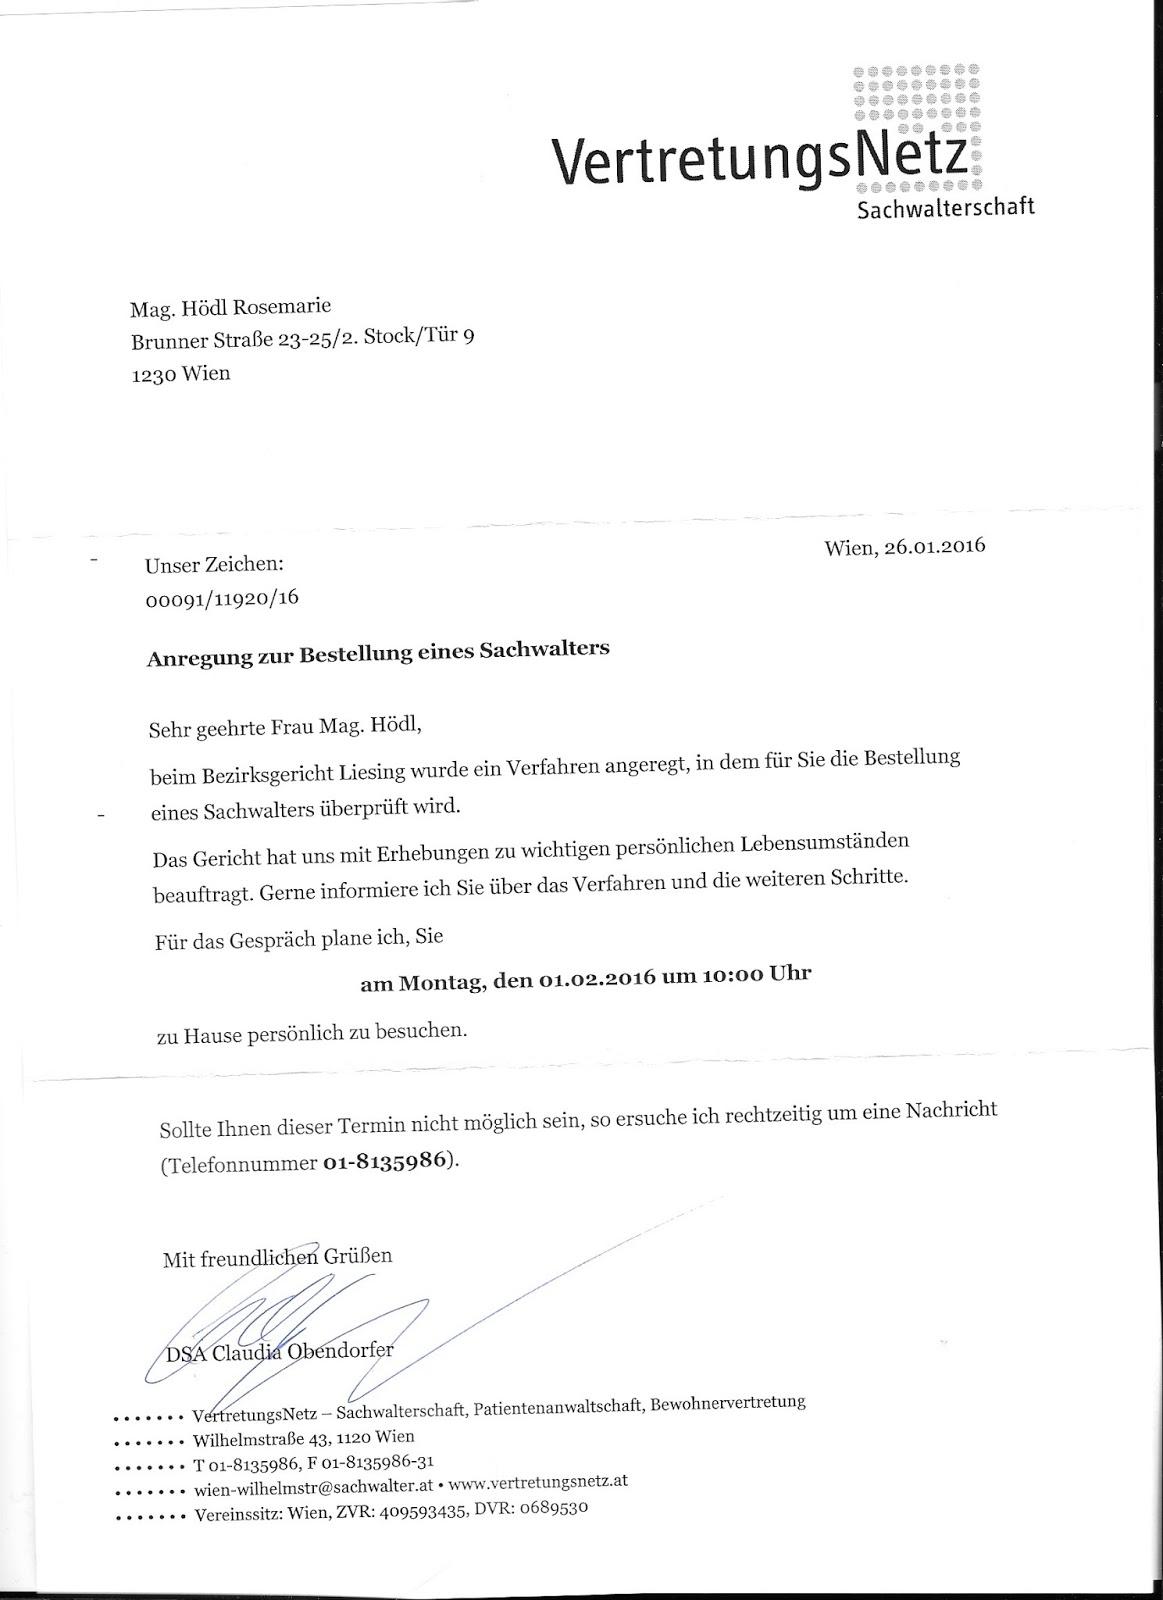 Justicia Austriaca: Februar 2016